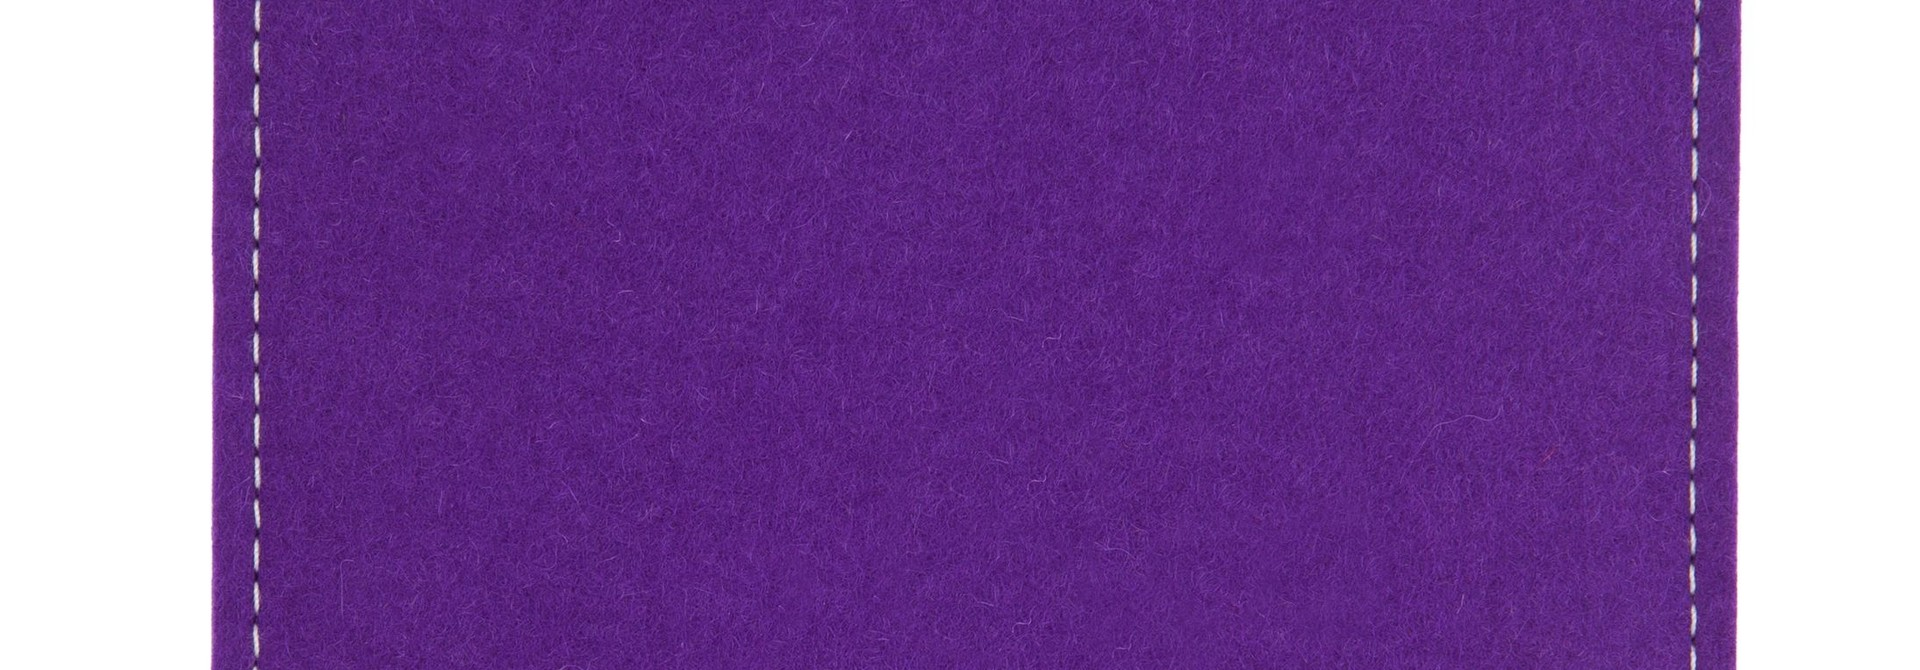 Paper Tablet Sleeve Purple